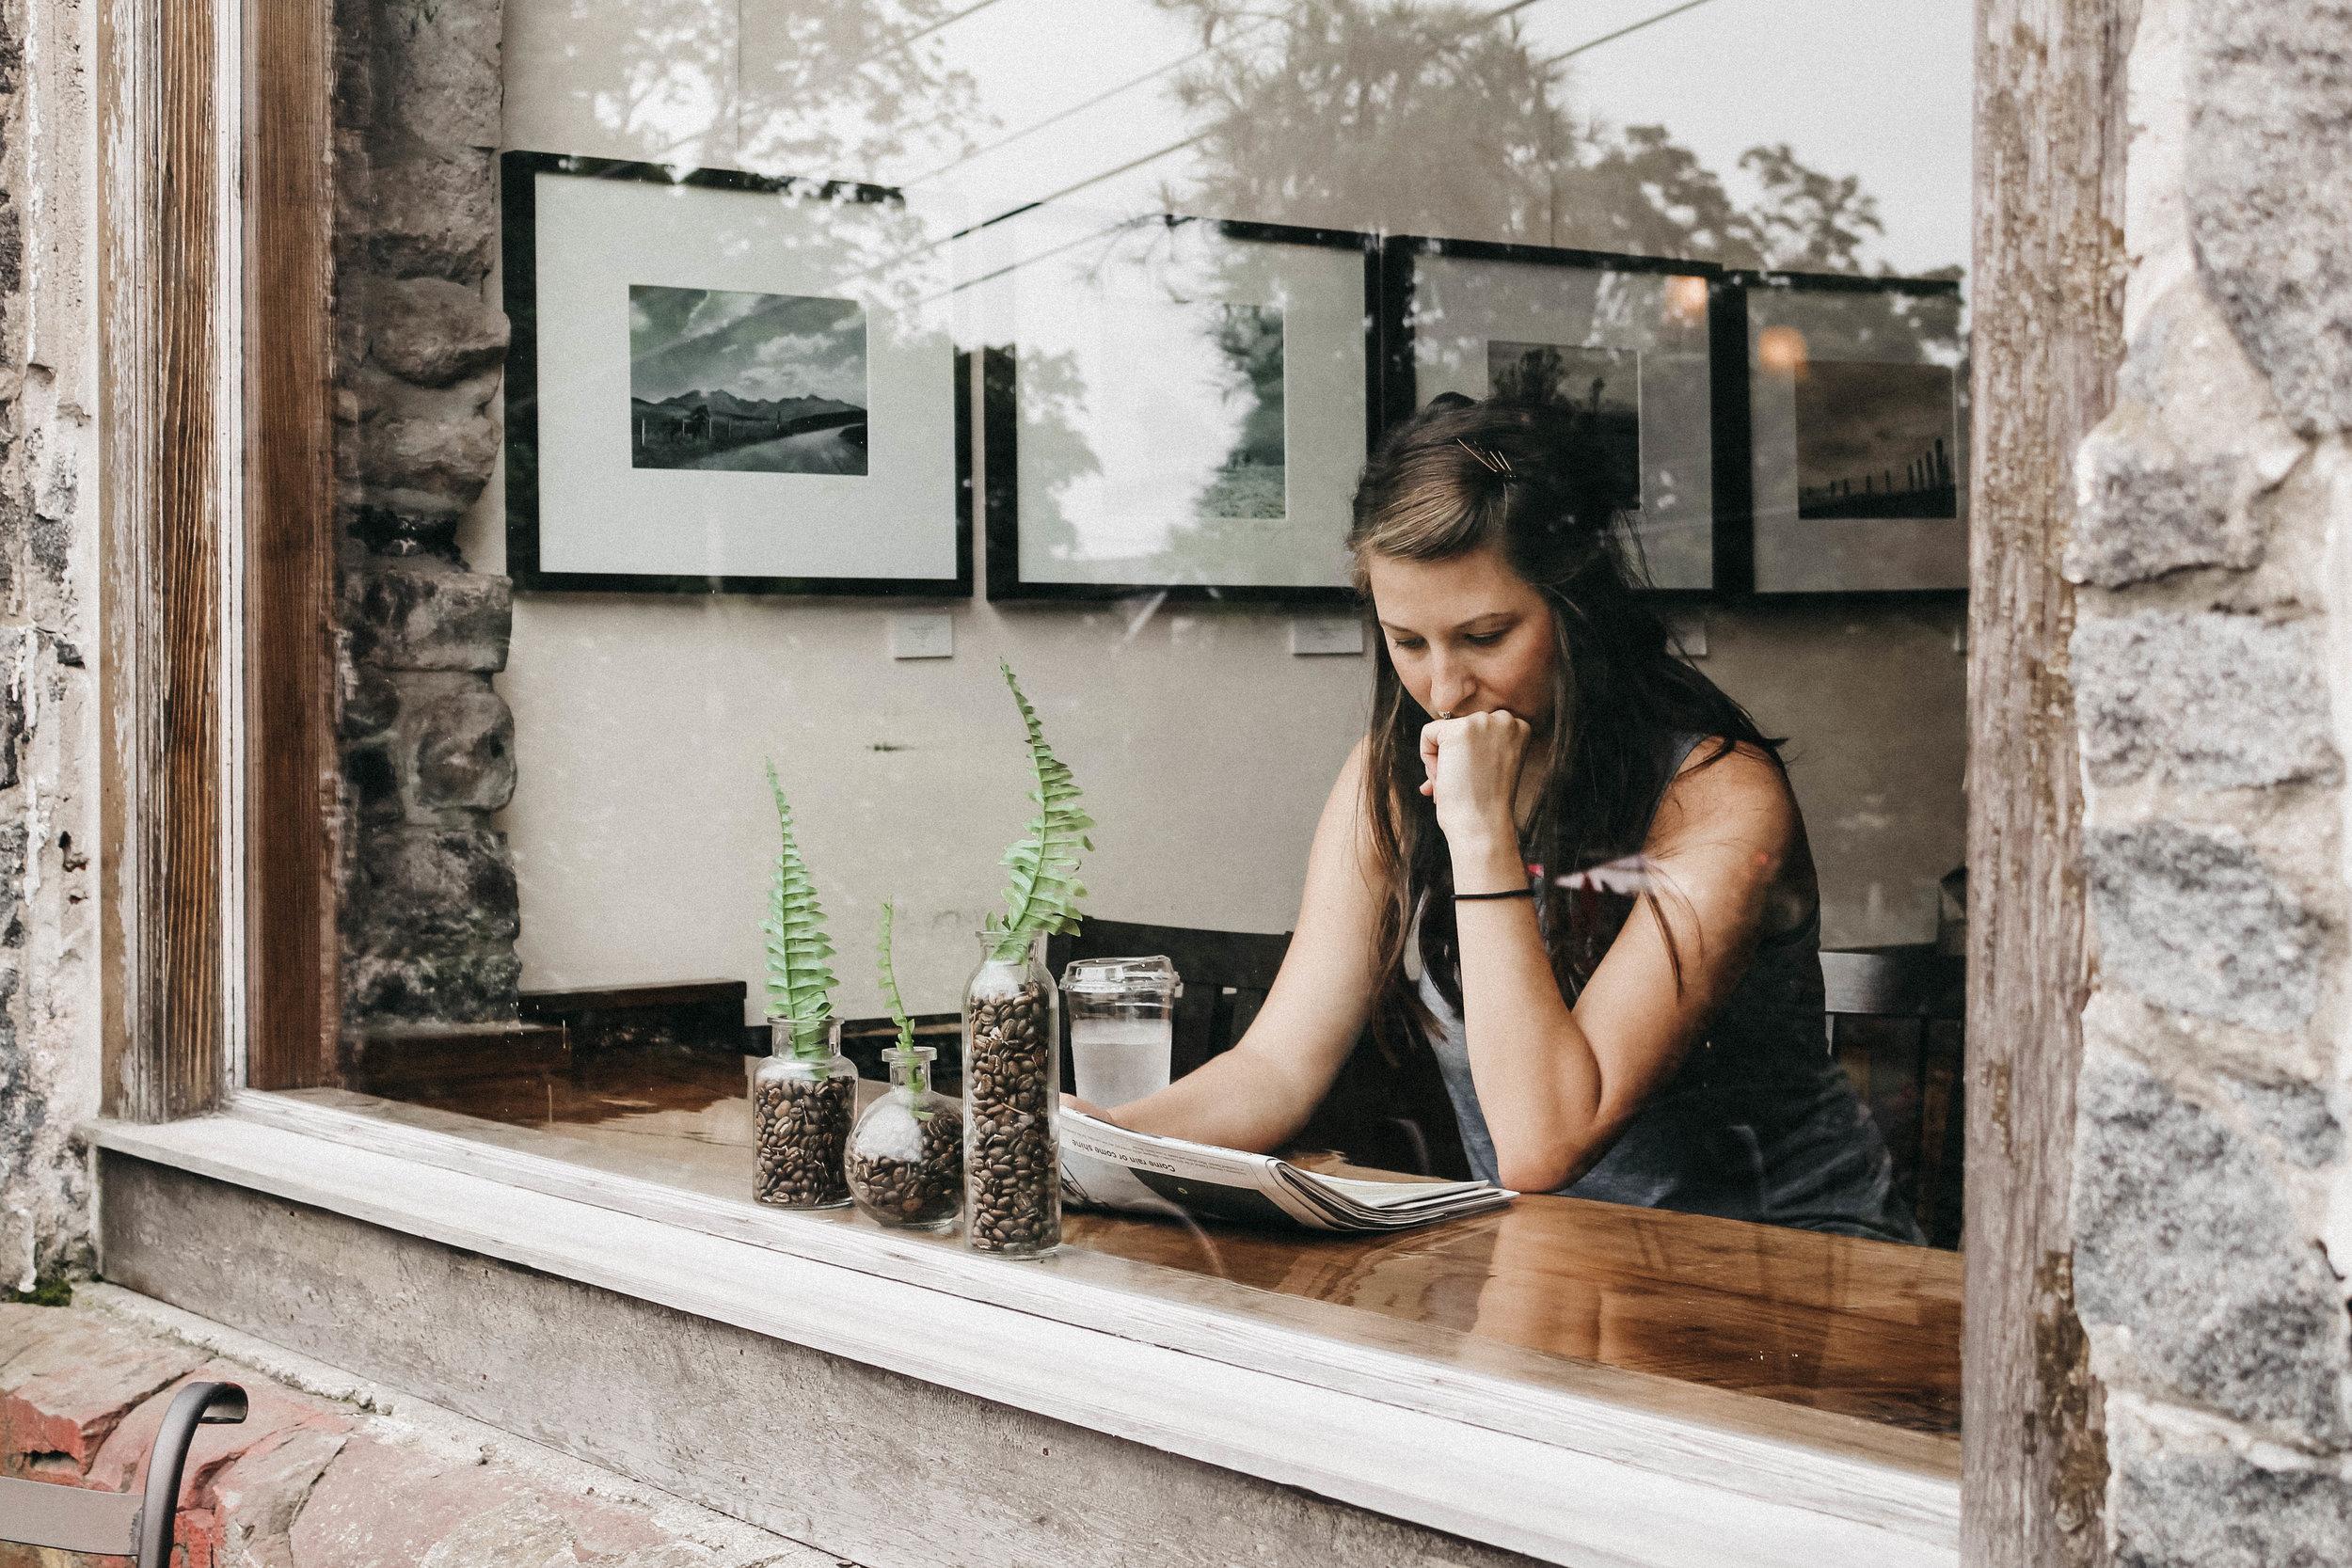 brigodoon coffeehouse woman drinking coffee in window.jpg